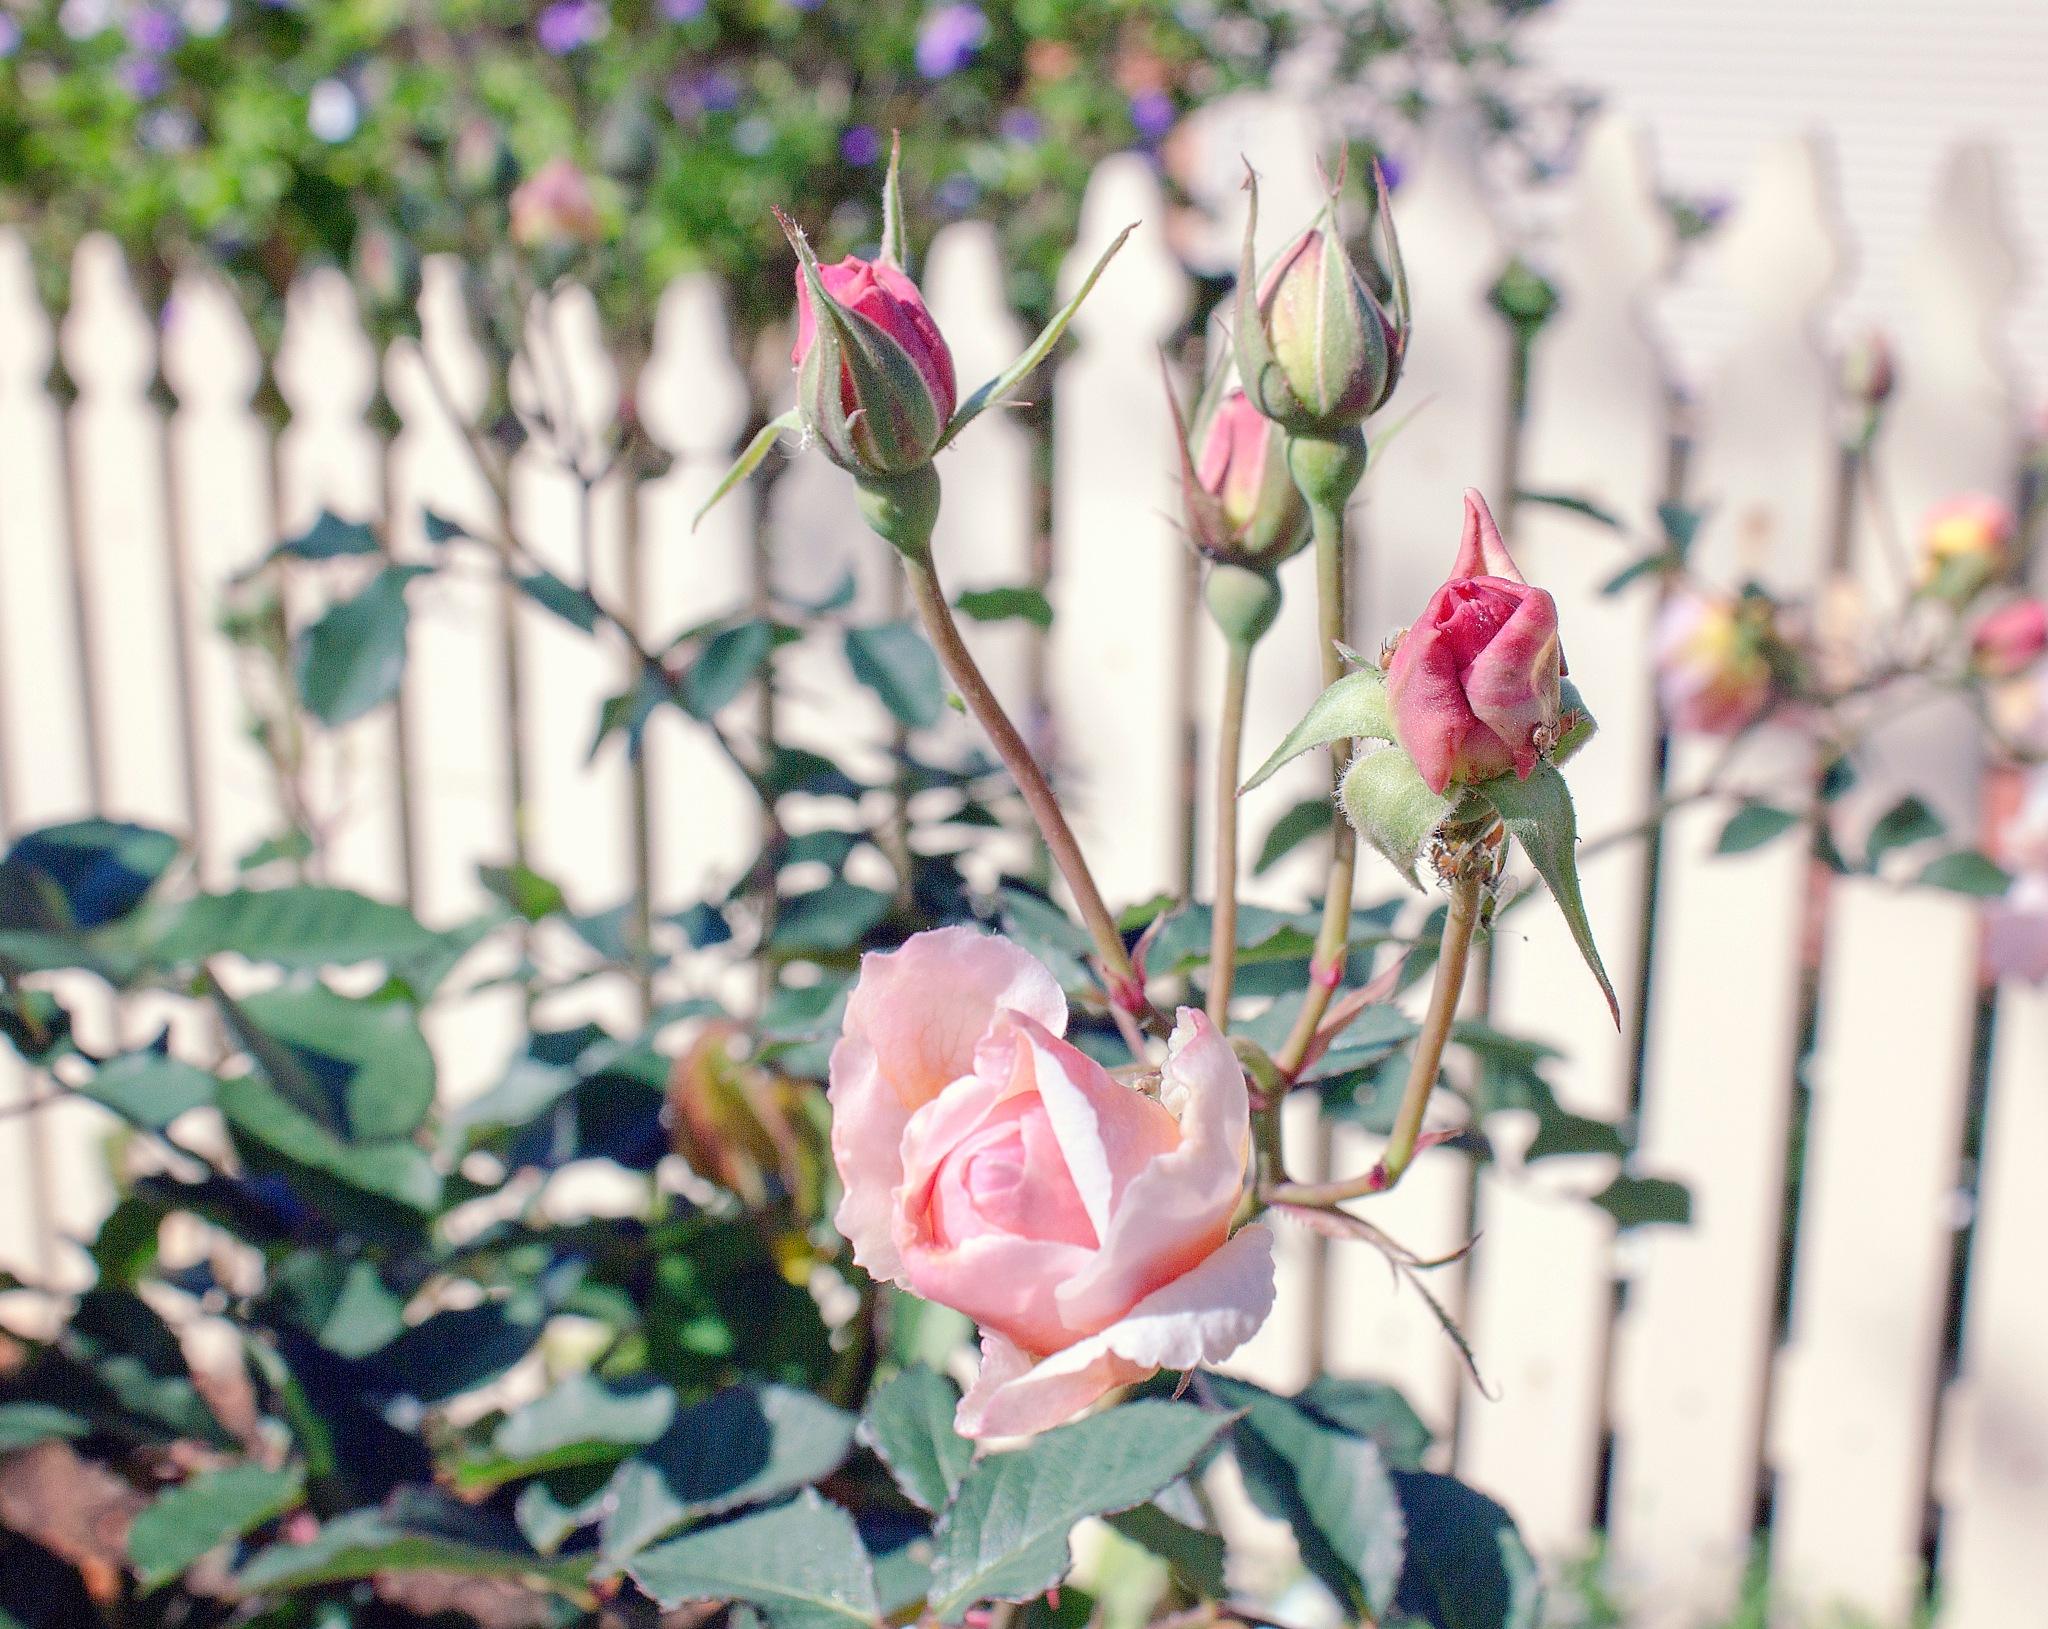 Rose Garden by Seven Treasures Photography